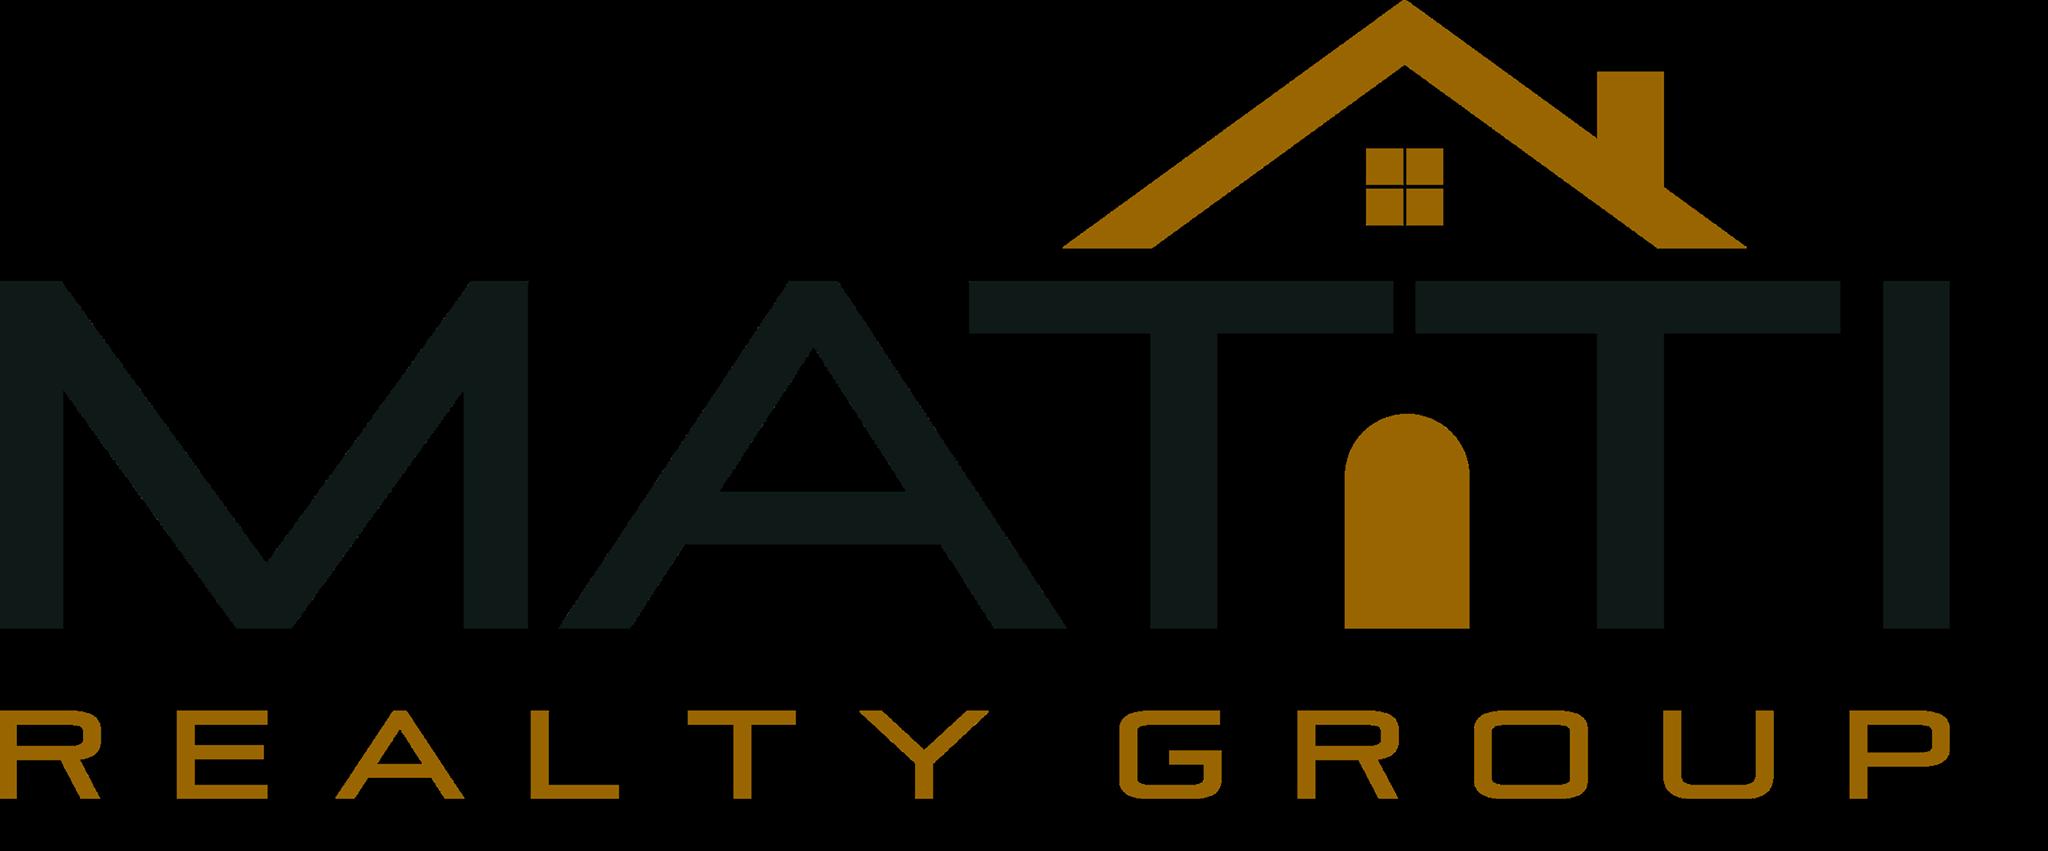 Matti Realty Group Logo